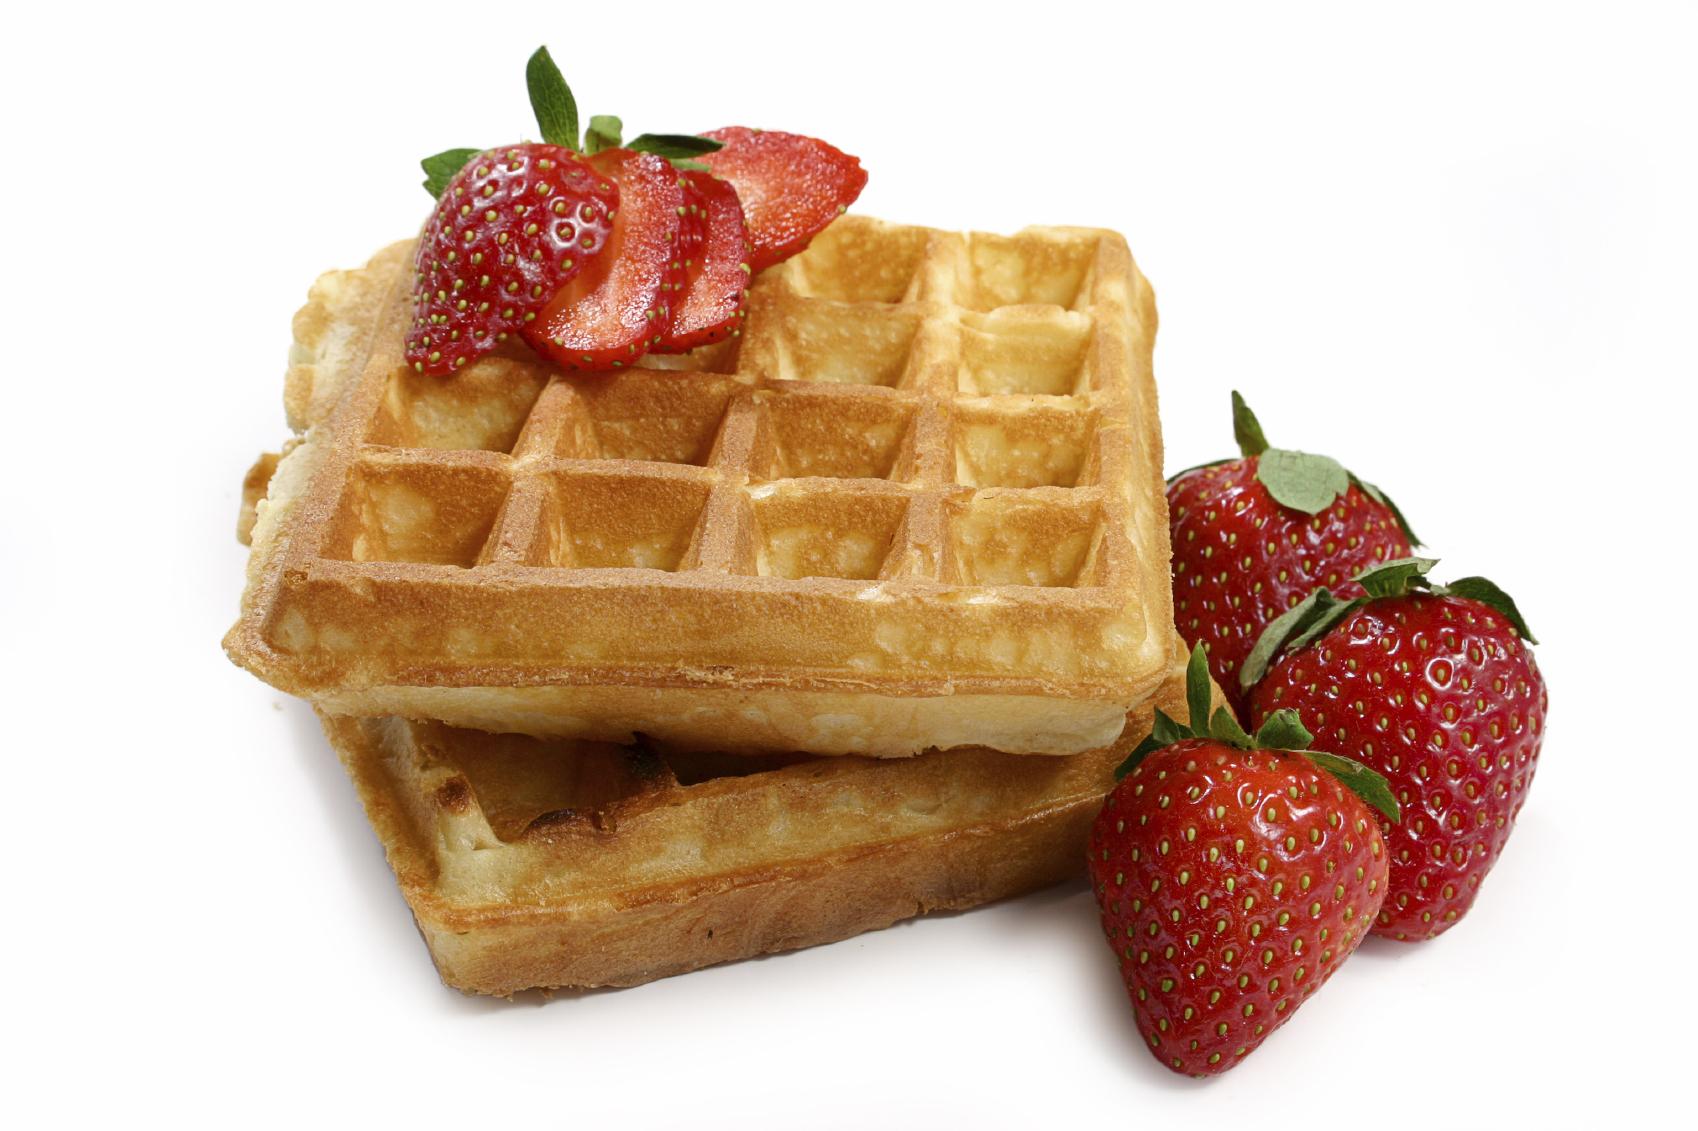 waffles-with-strawberrys-waffles-8008200-1698-1131.jpg